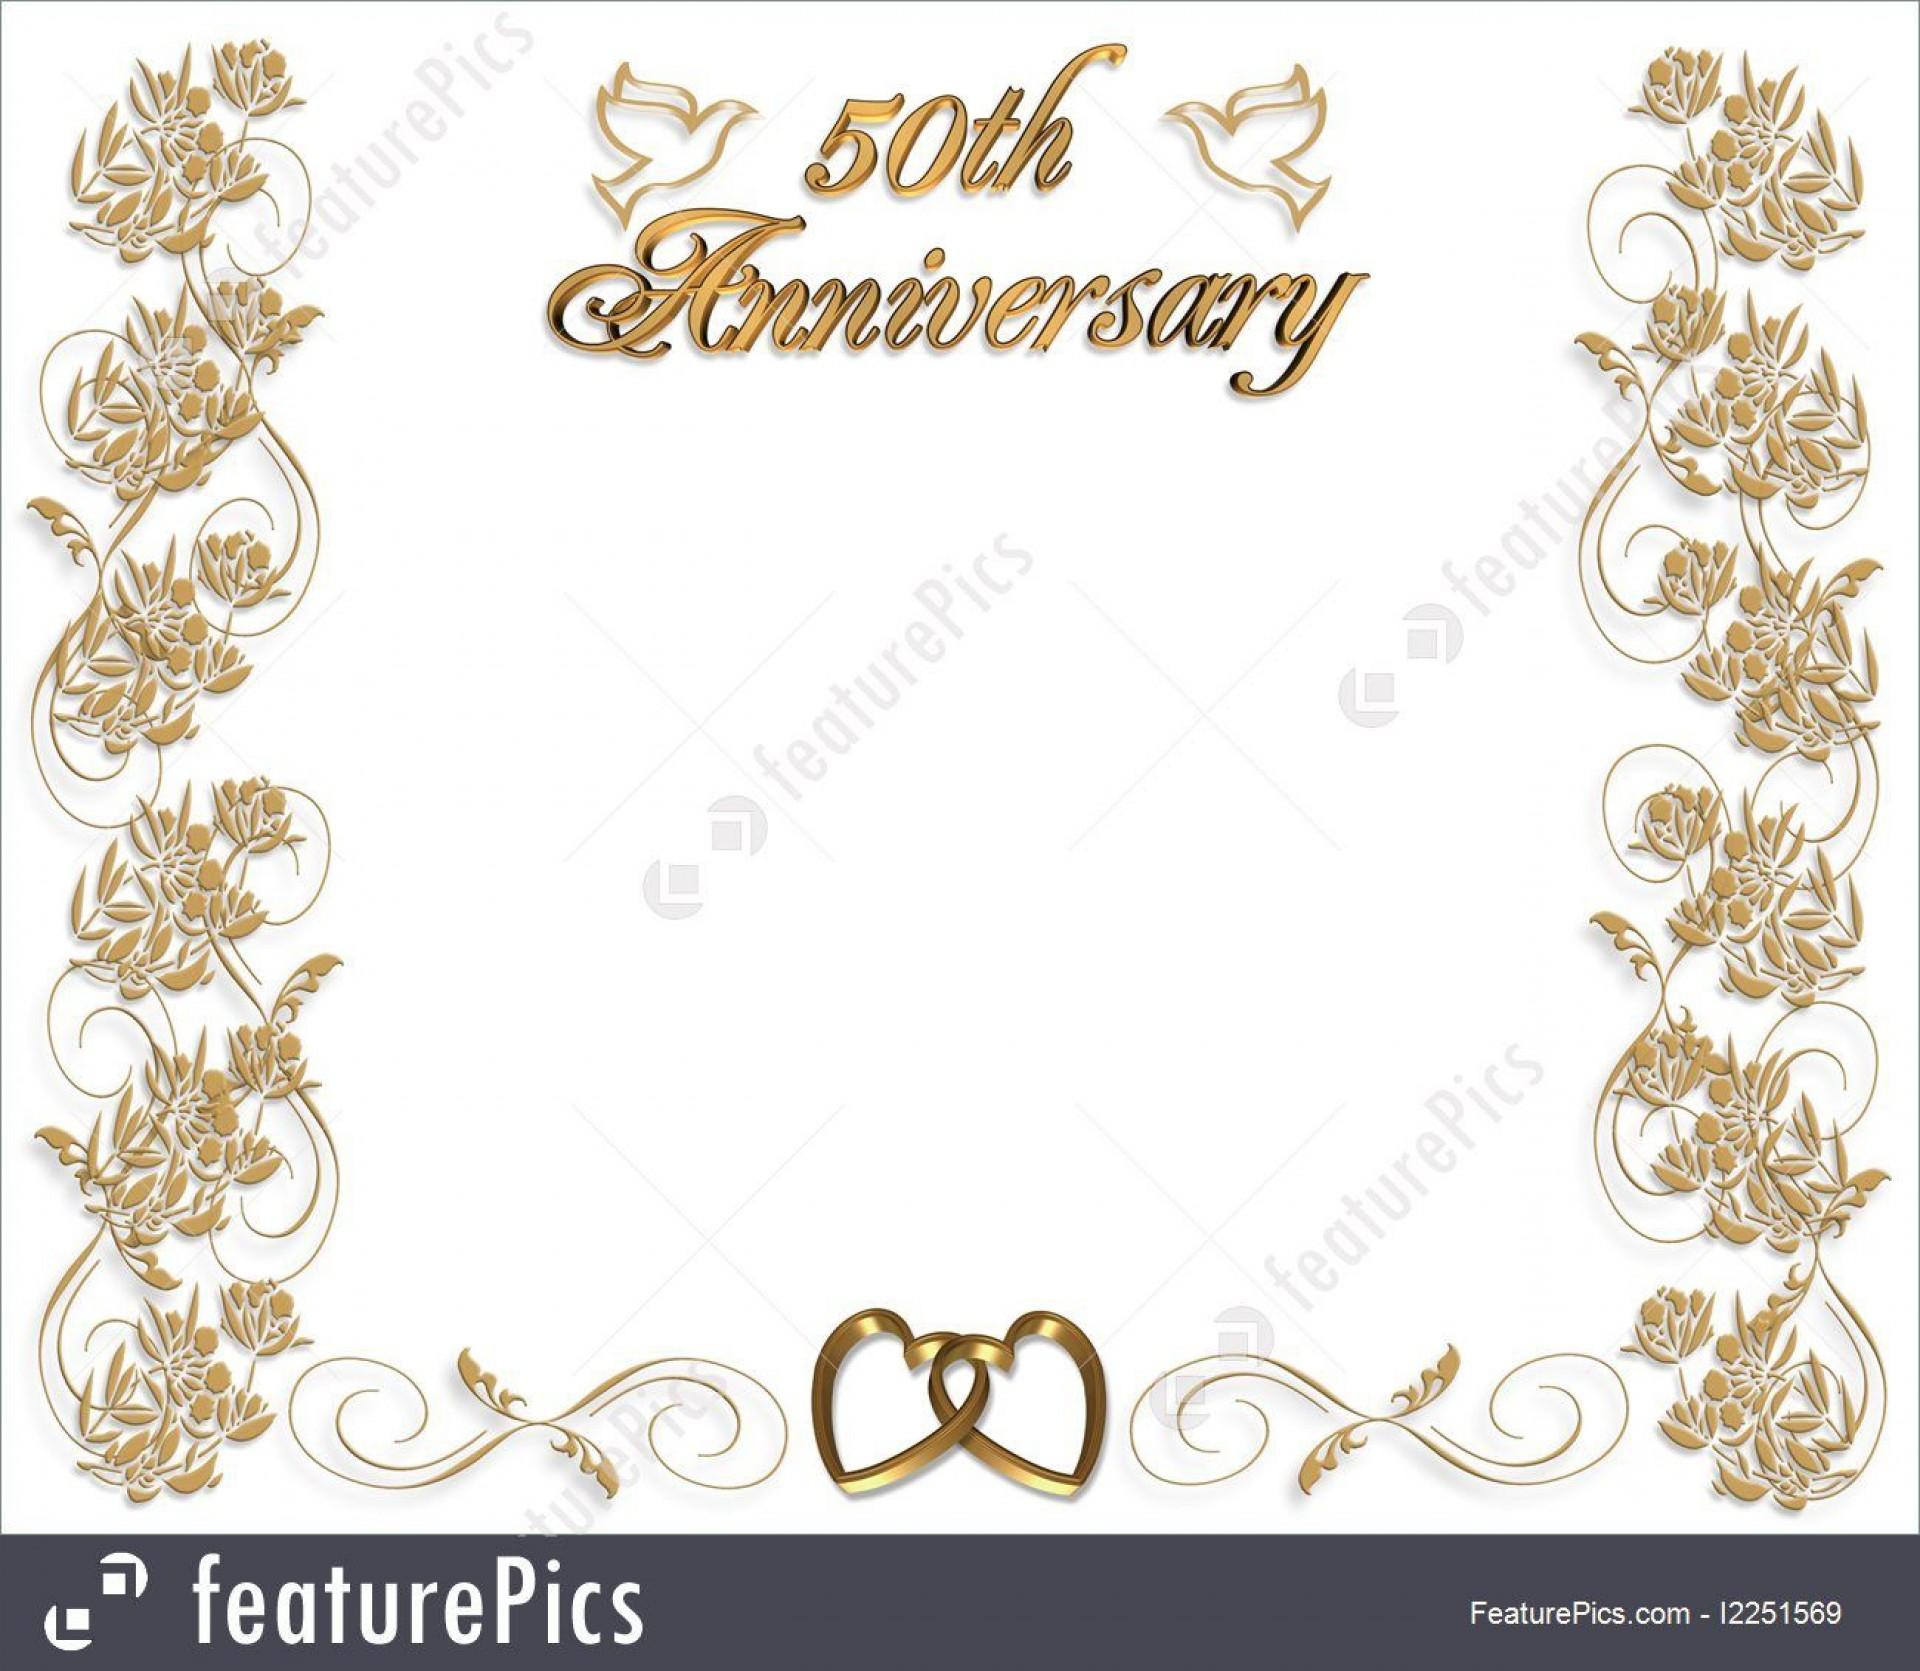 009 Shocking 50th Anniversary Invitation Template High Resolution  Templates Wedding Free Download Golden1920